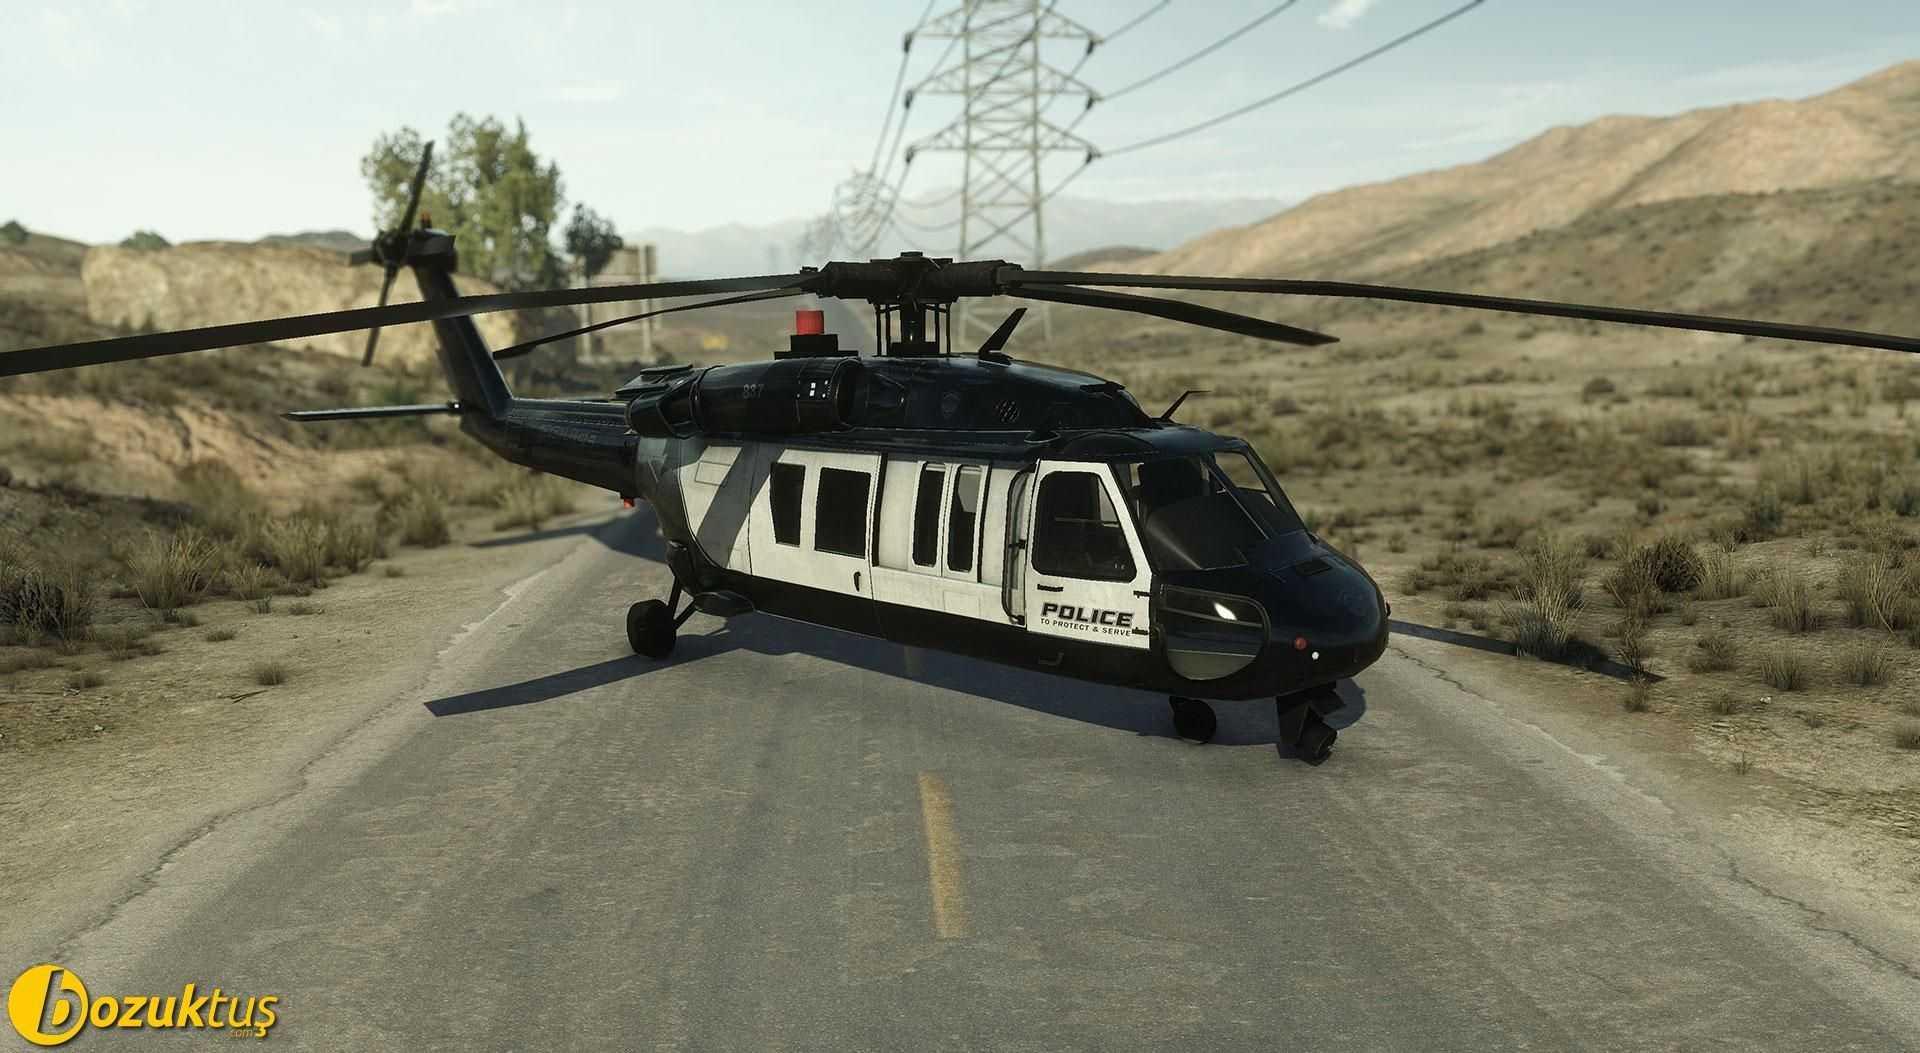 battlefield-hardline-polis-helikopter-2